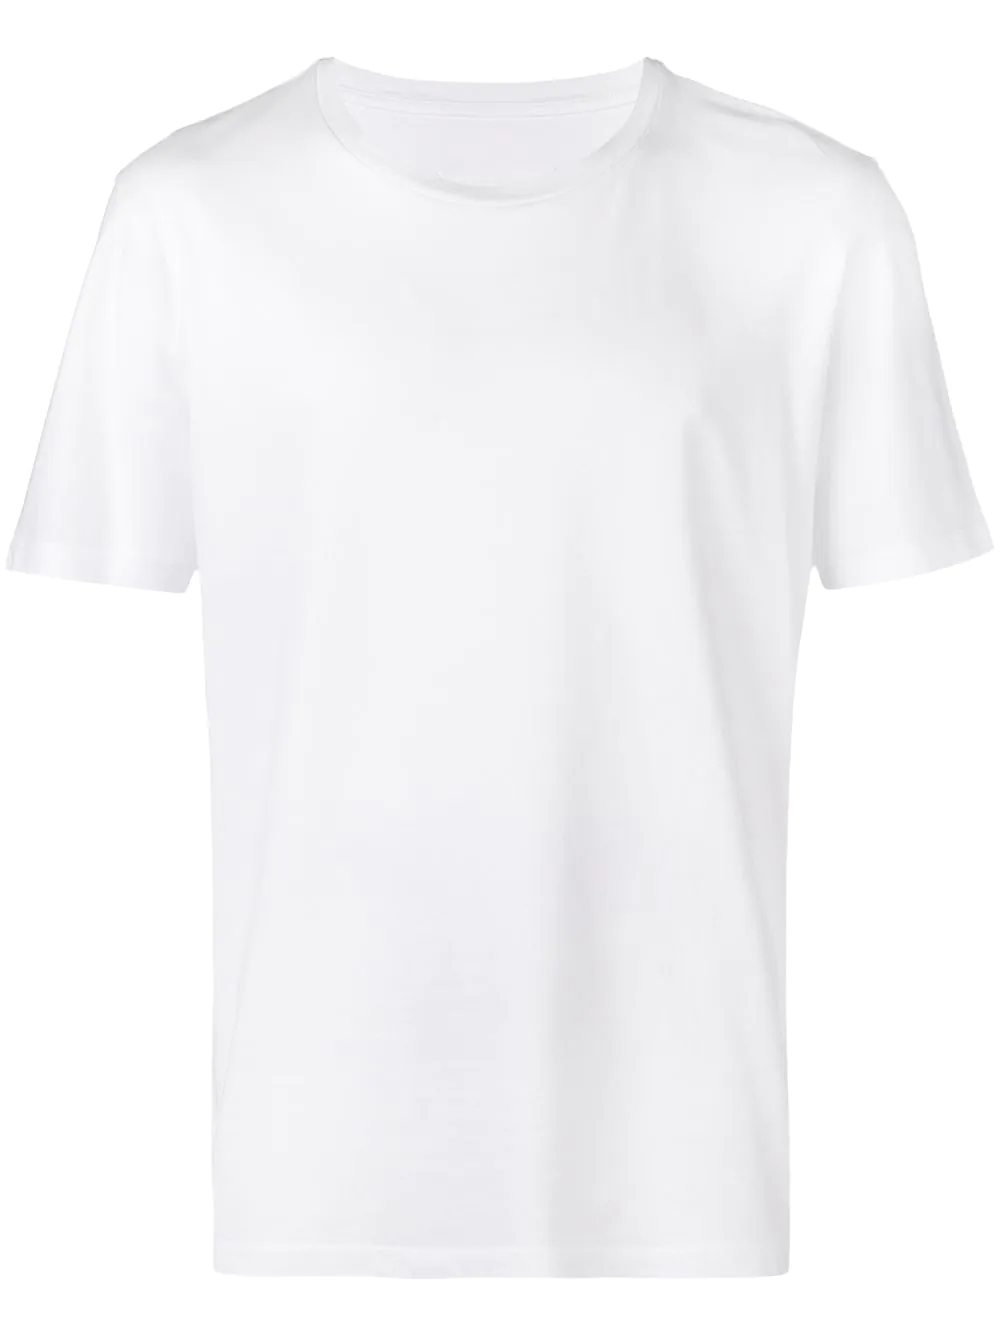 Maison Margiela   футболка свободного кроя с короткими рукавами   Clouty